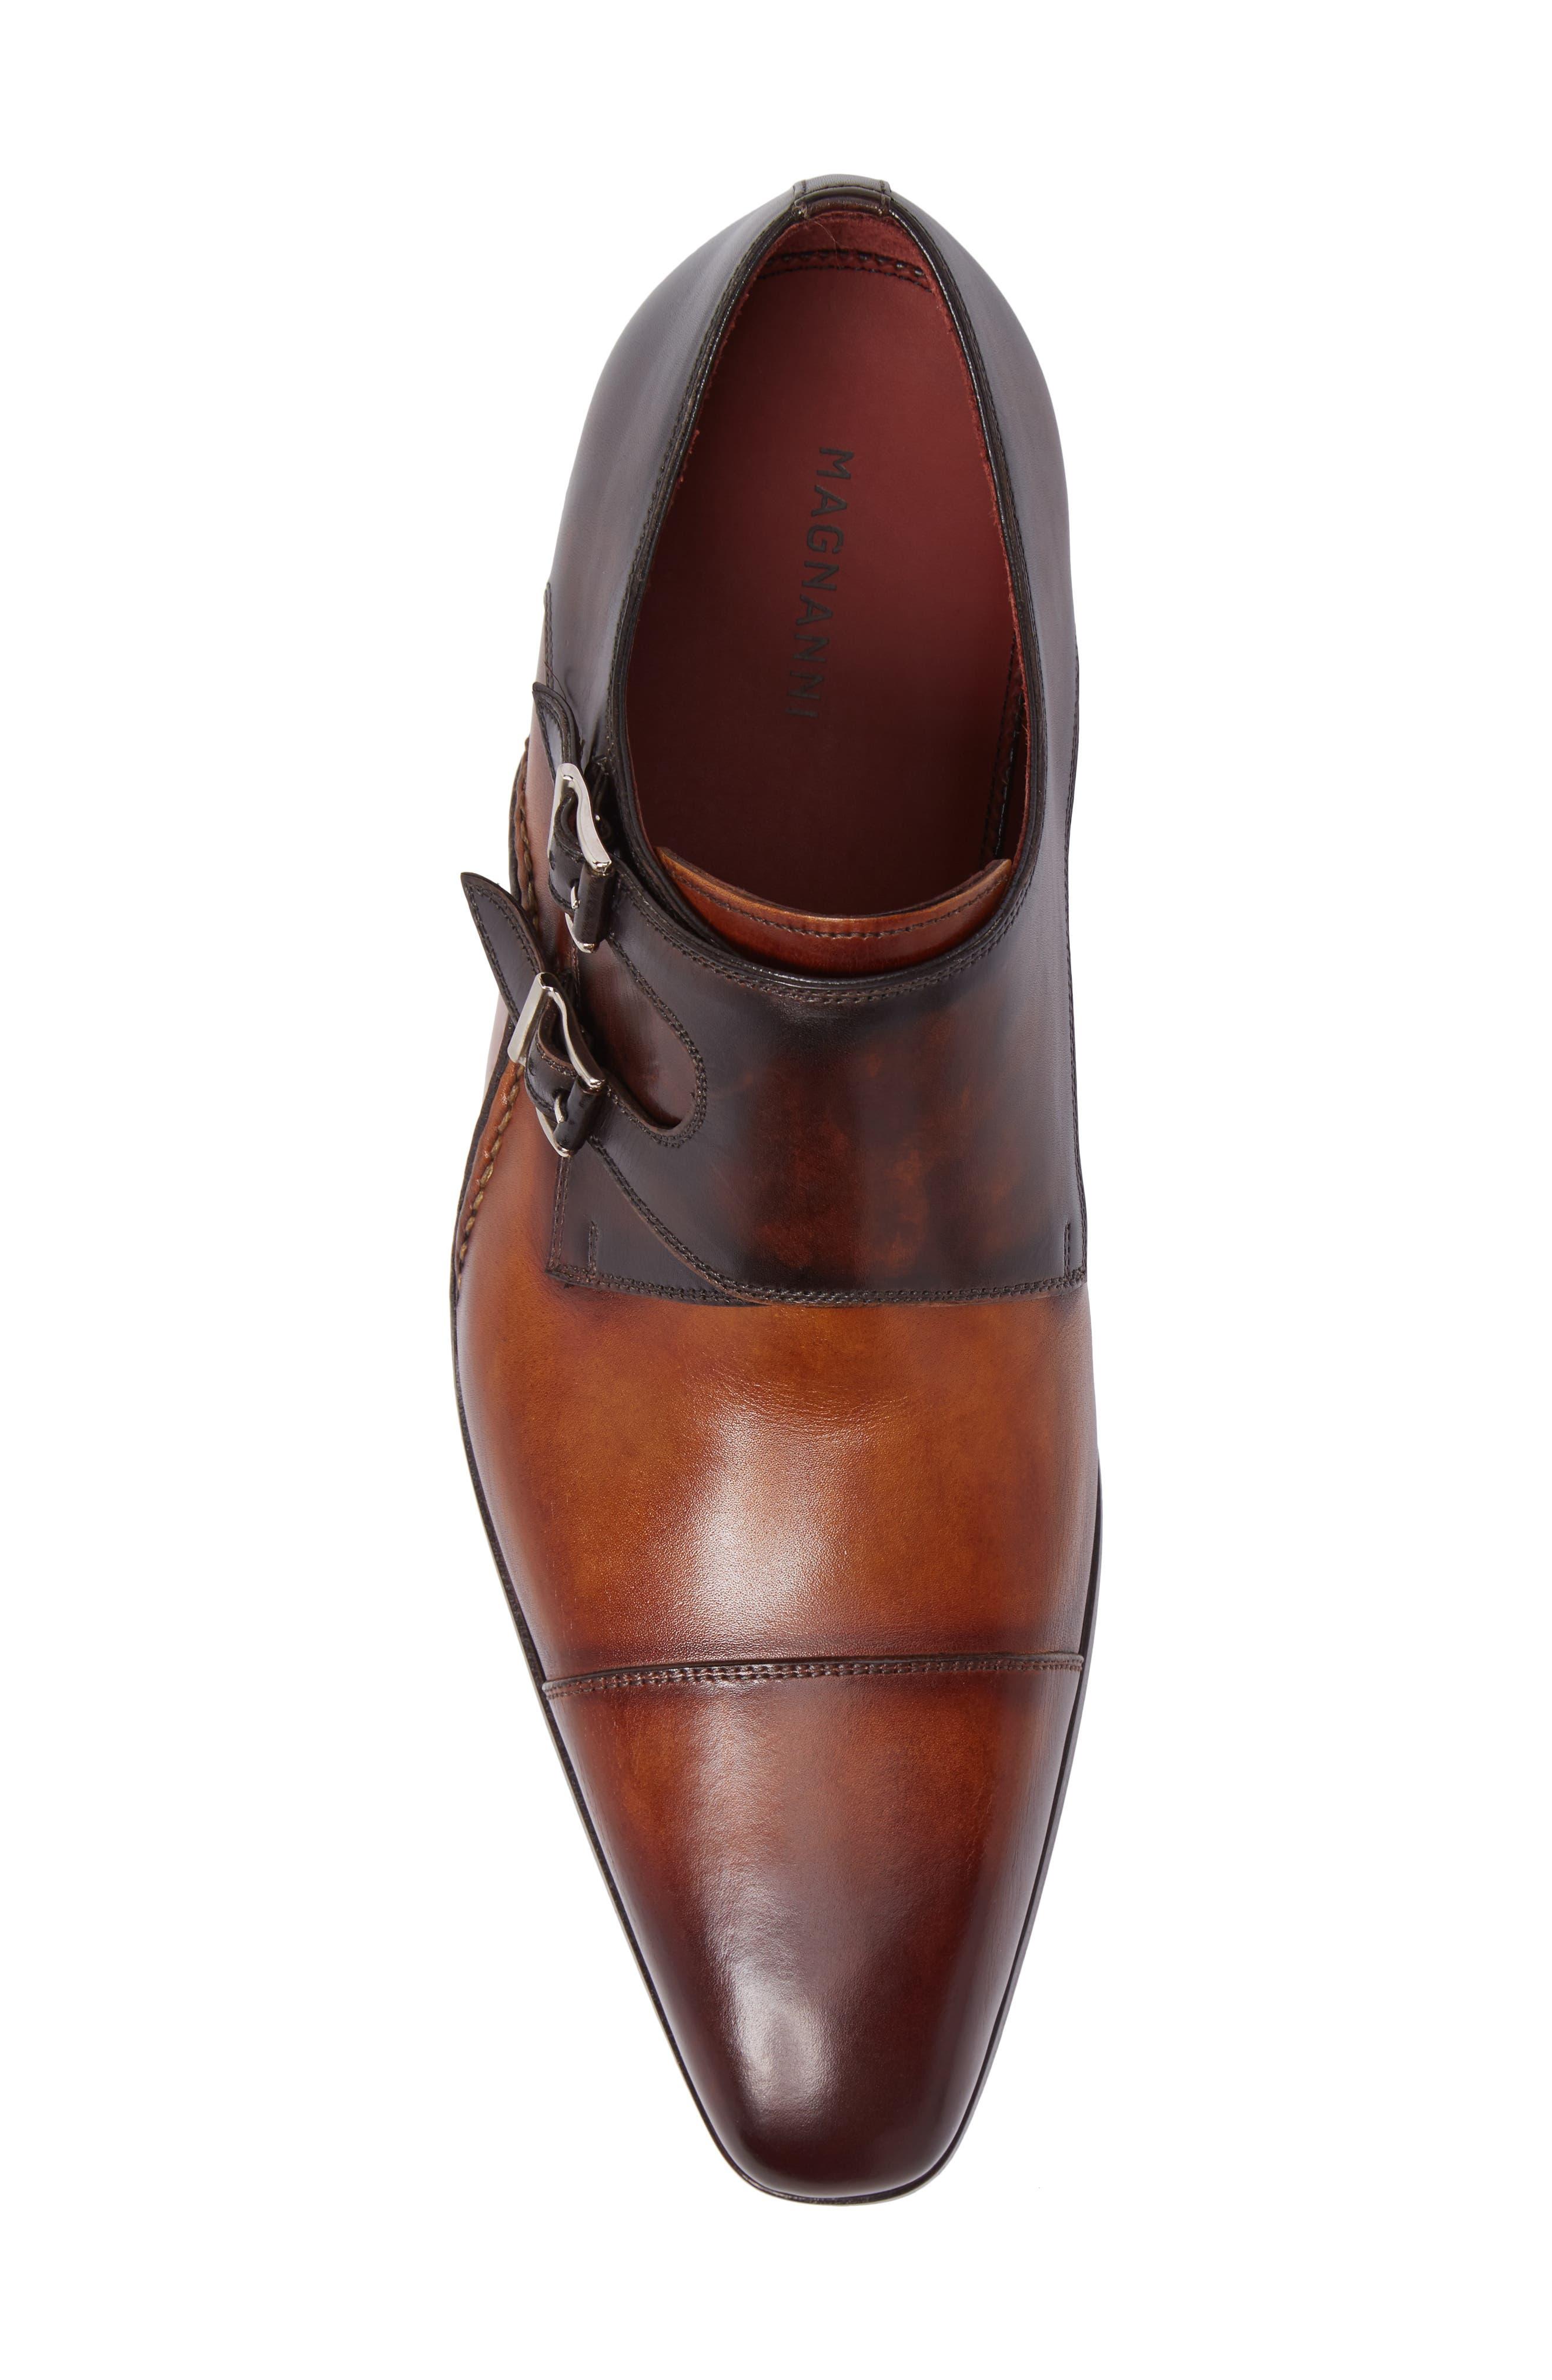 MAGNANNI,                             Ondara Double Monk Strap Shoe,                             Alternate thumbnail 5, color,                             CUERO/ BROWN LEATHER